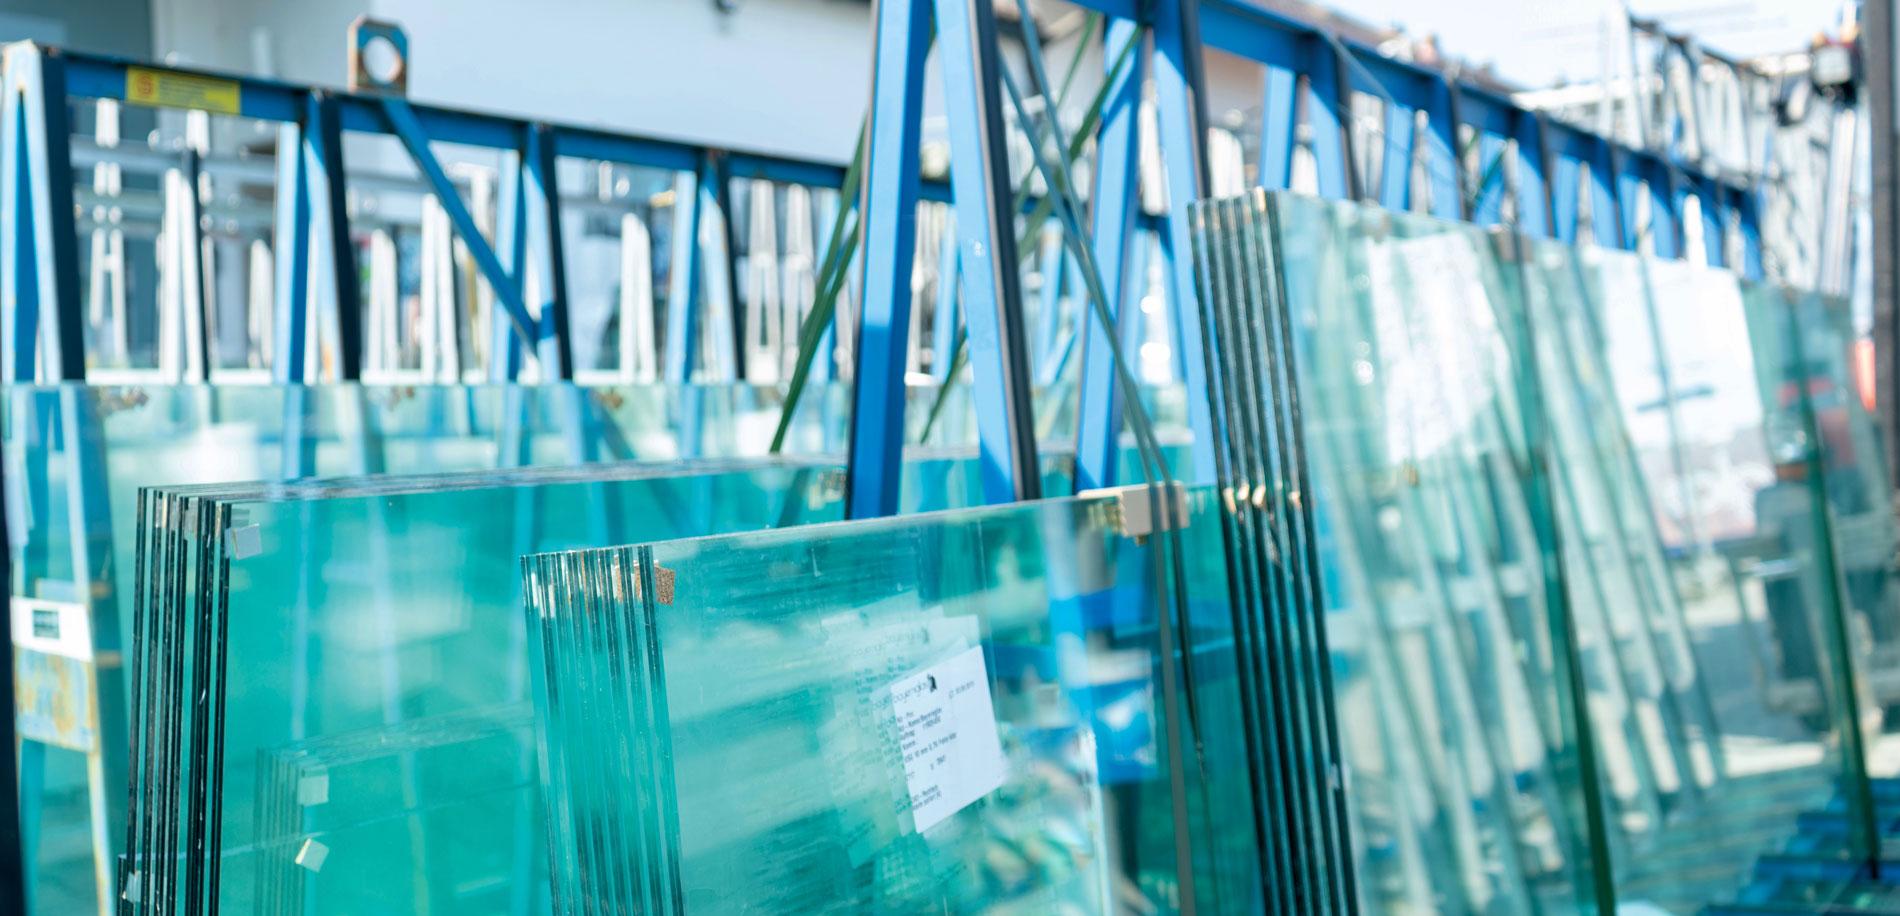 Glasgroßhandel München Bayernglas